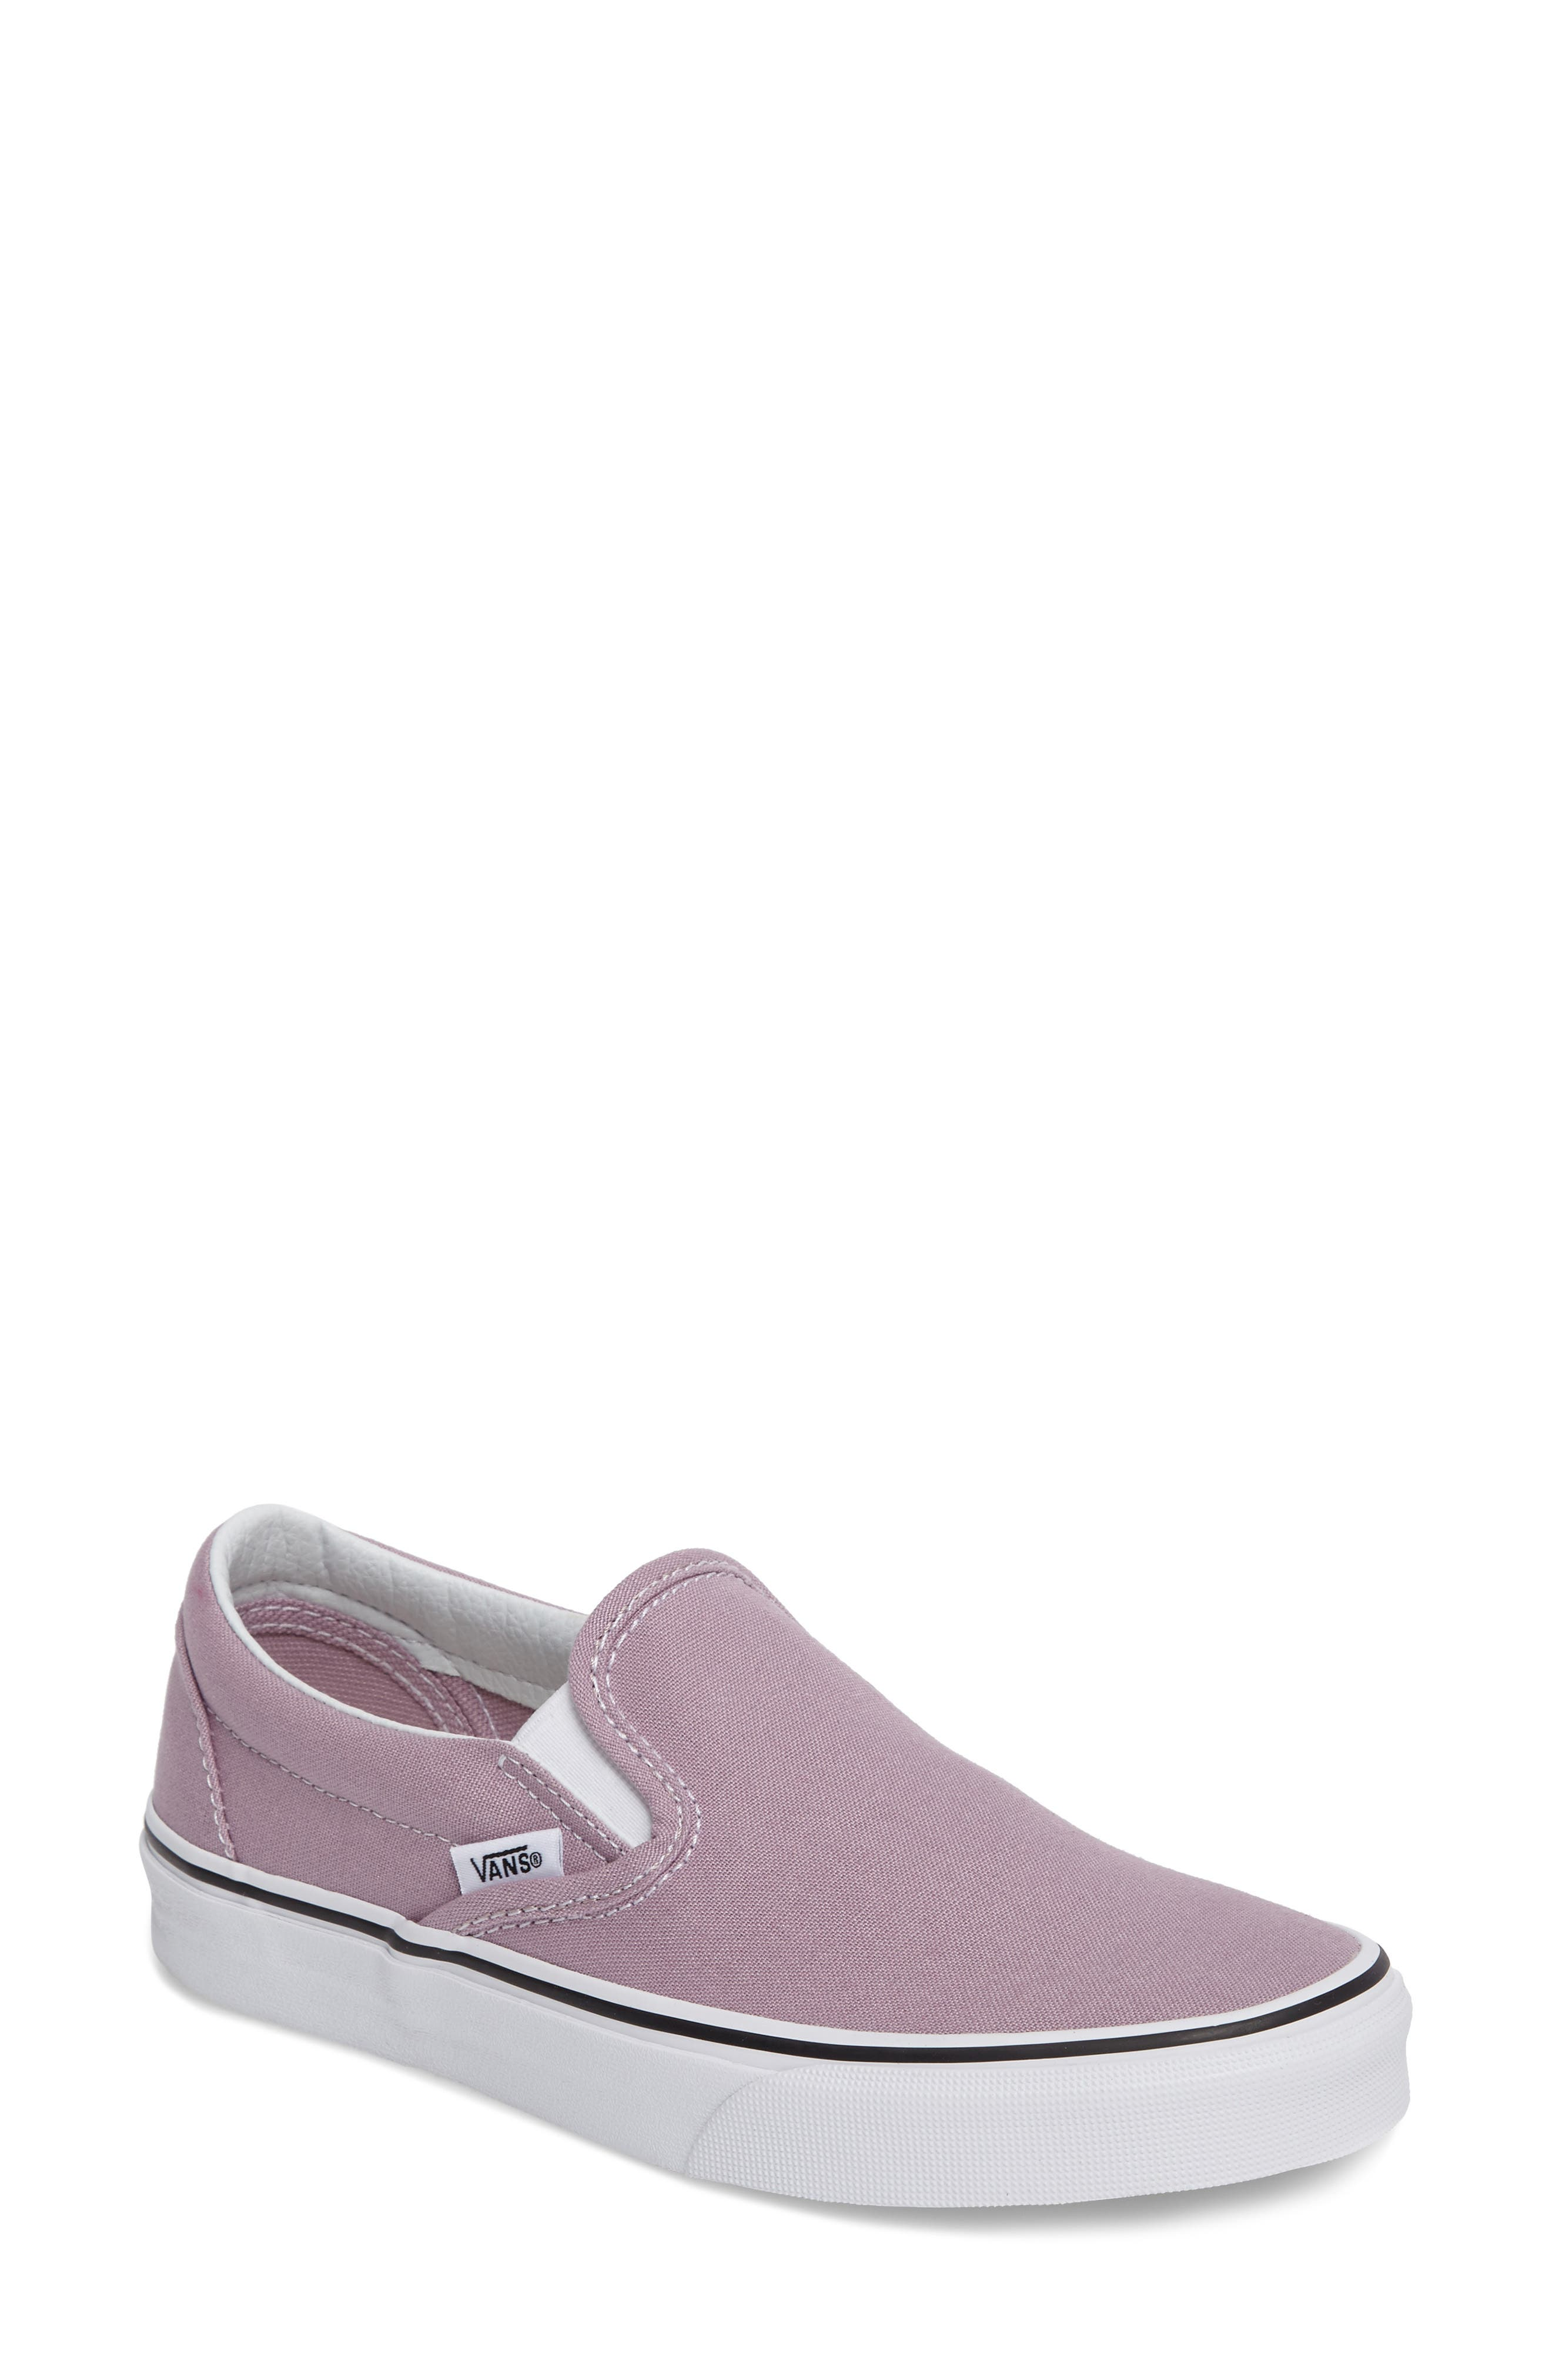 ,                             Classic Slip-On Sneaker,                             Main thumbnail 372, color,                             555